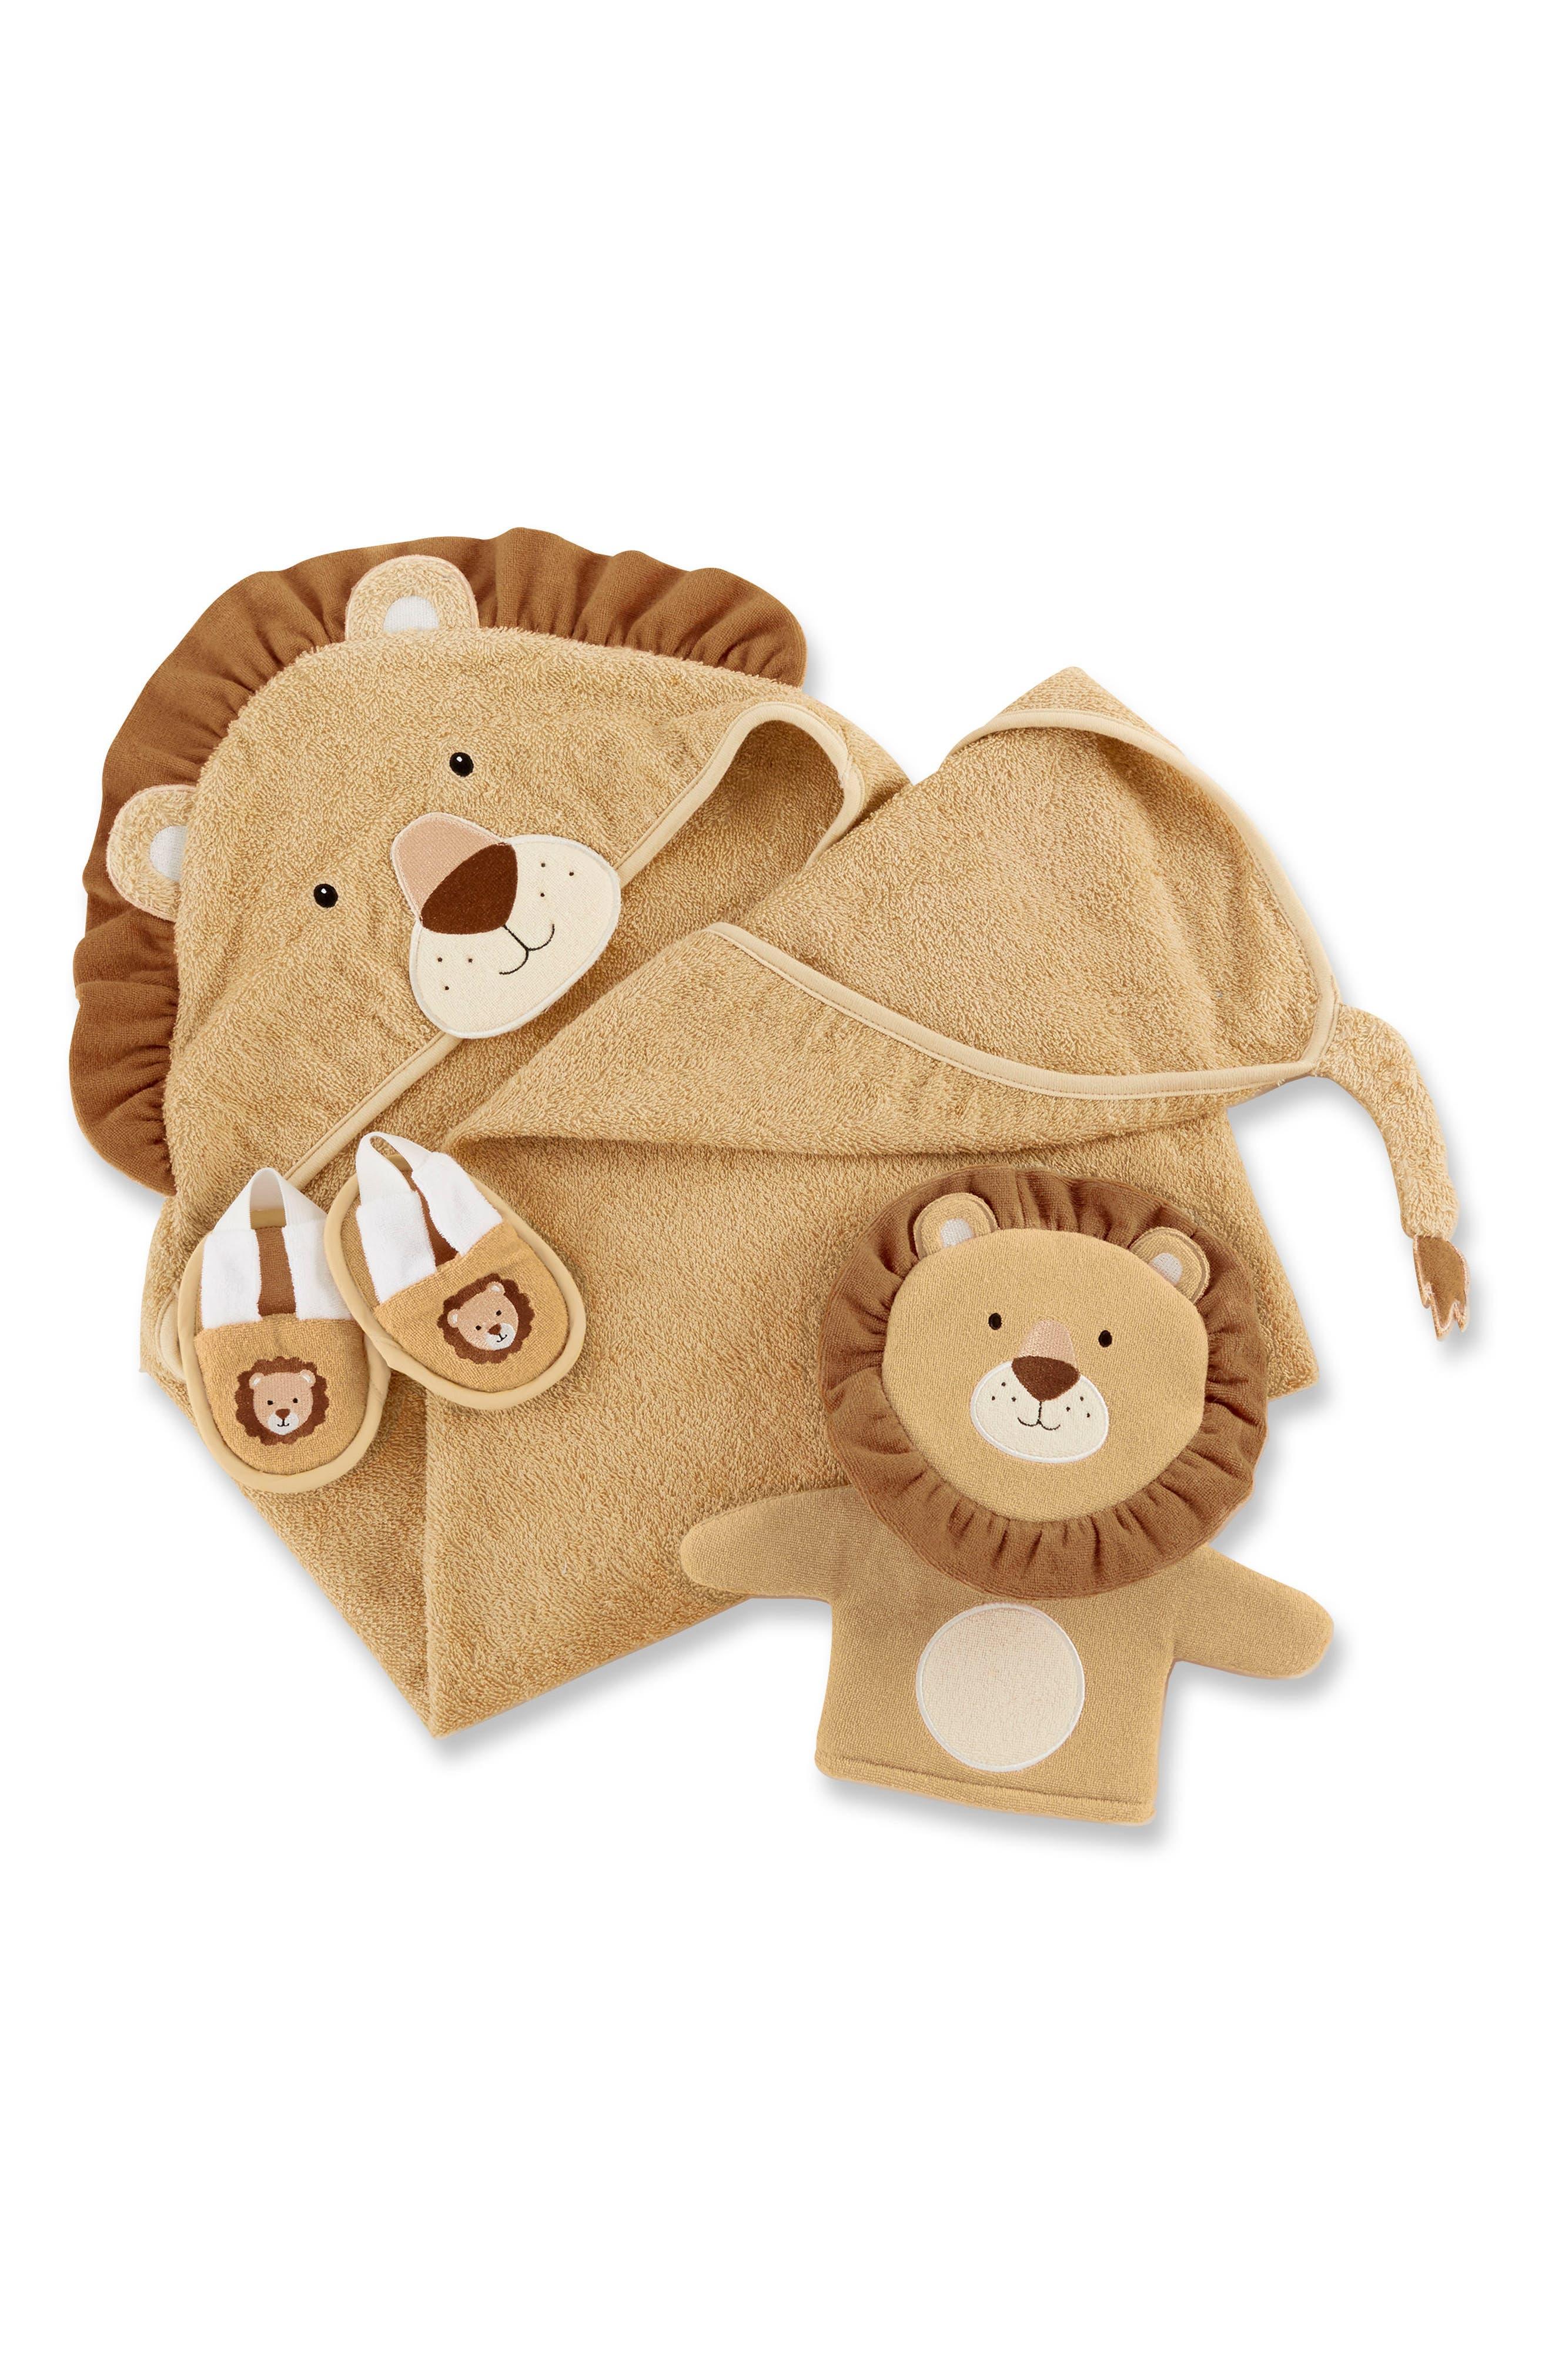 Baby Aspen Lion Hooded Robe, Bath Mitt & Slippers Set (Baby)